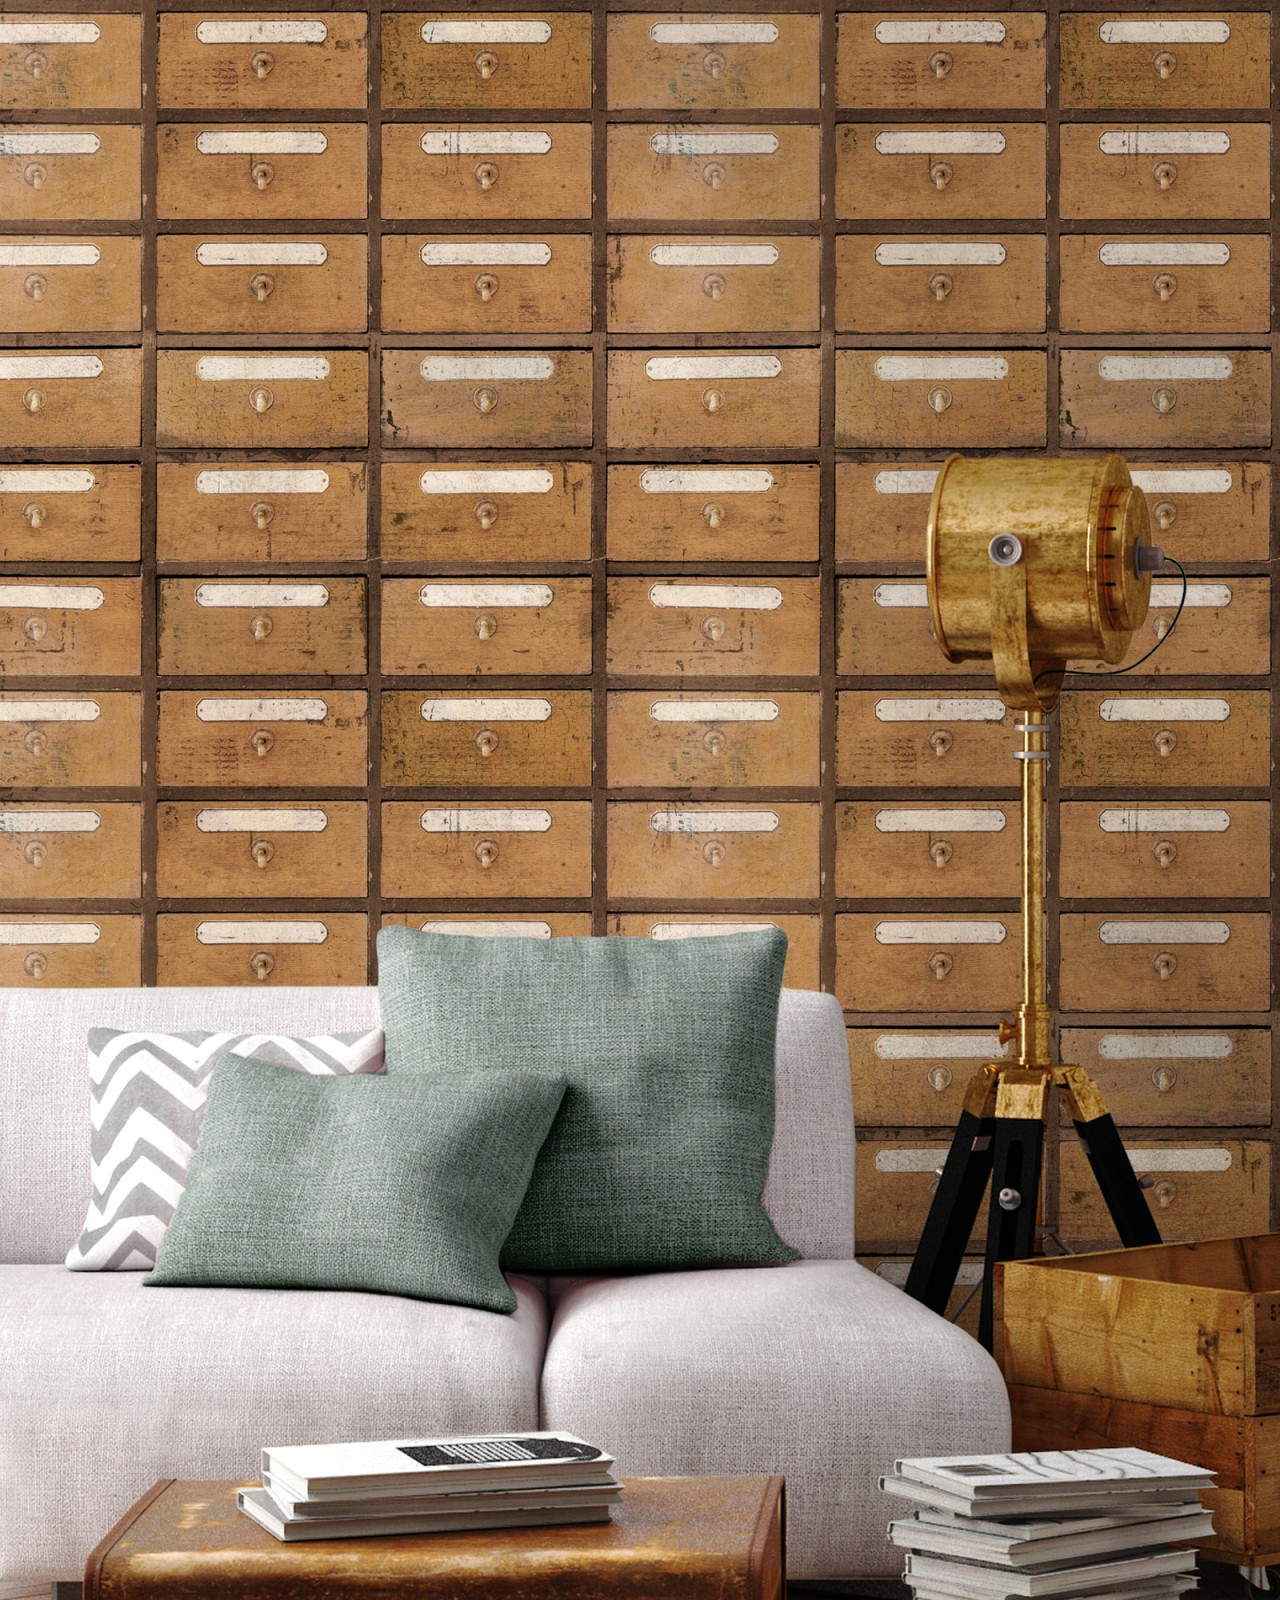 VINTAGE PHARMACY Premium Wallpaper